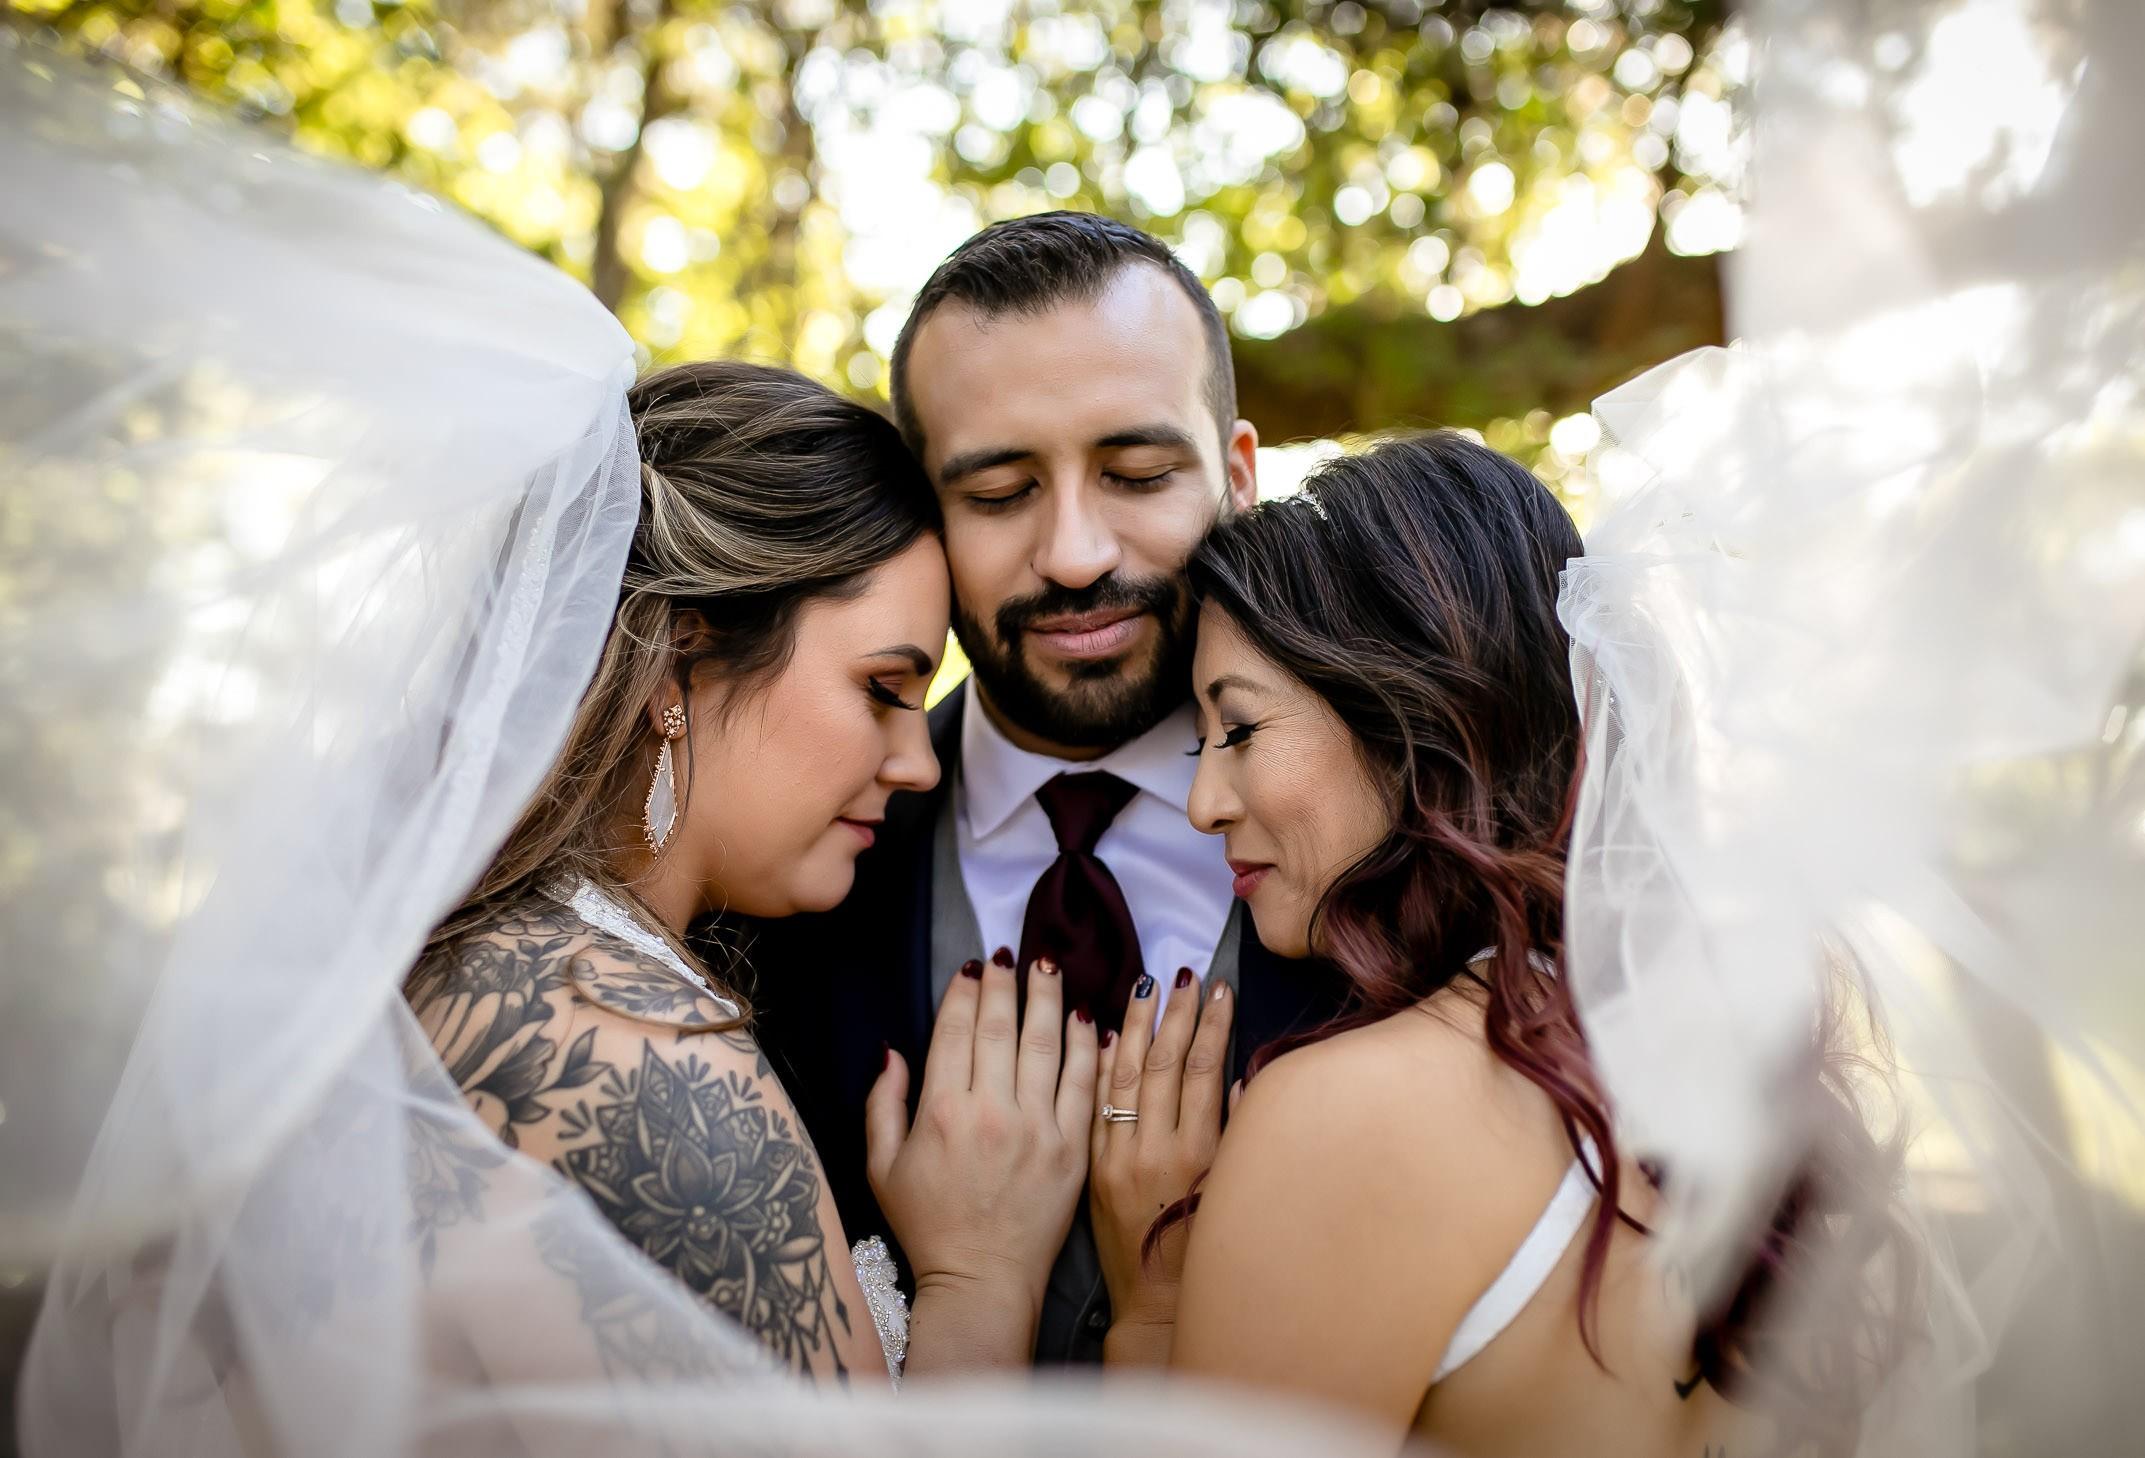 A Polyamory Wedding